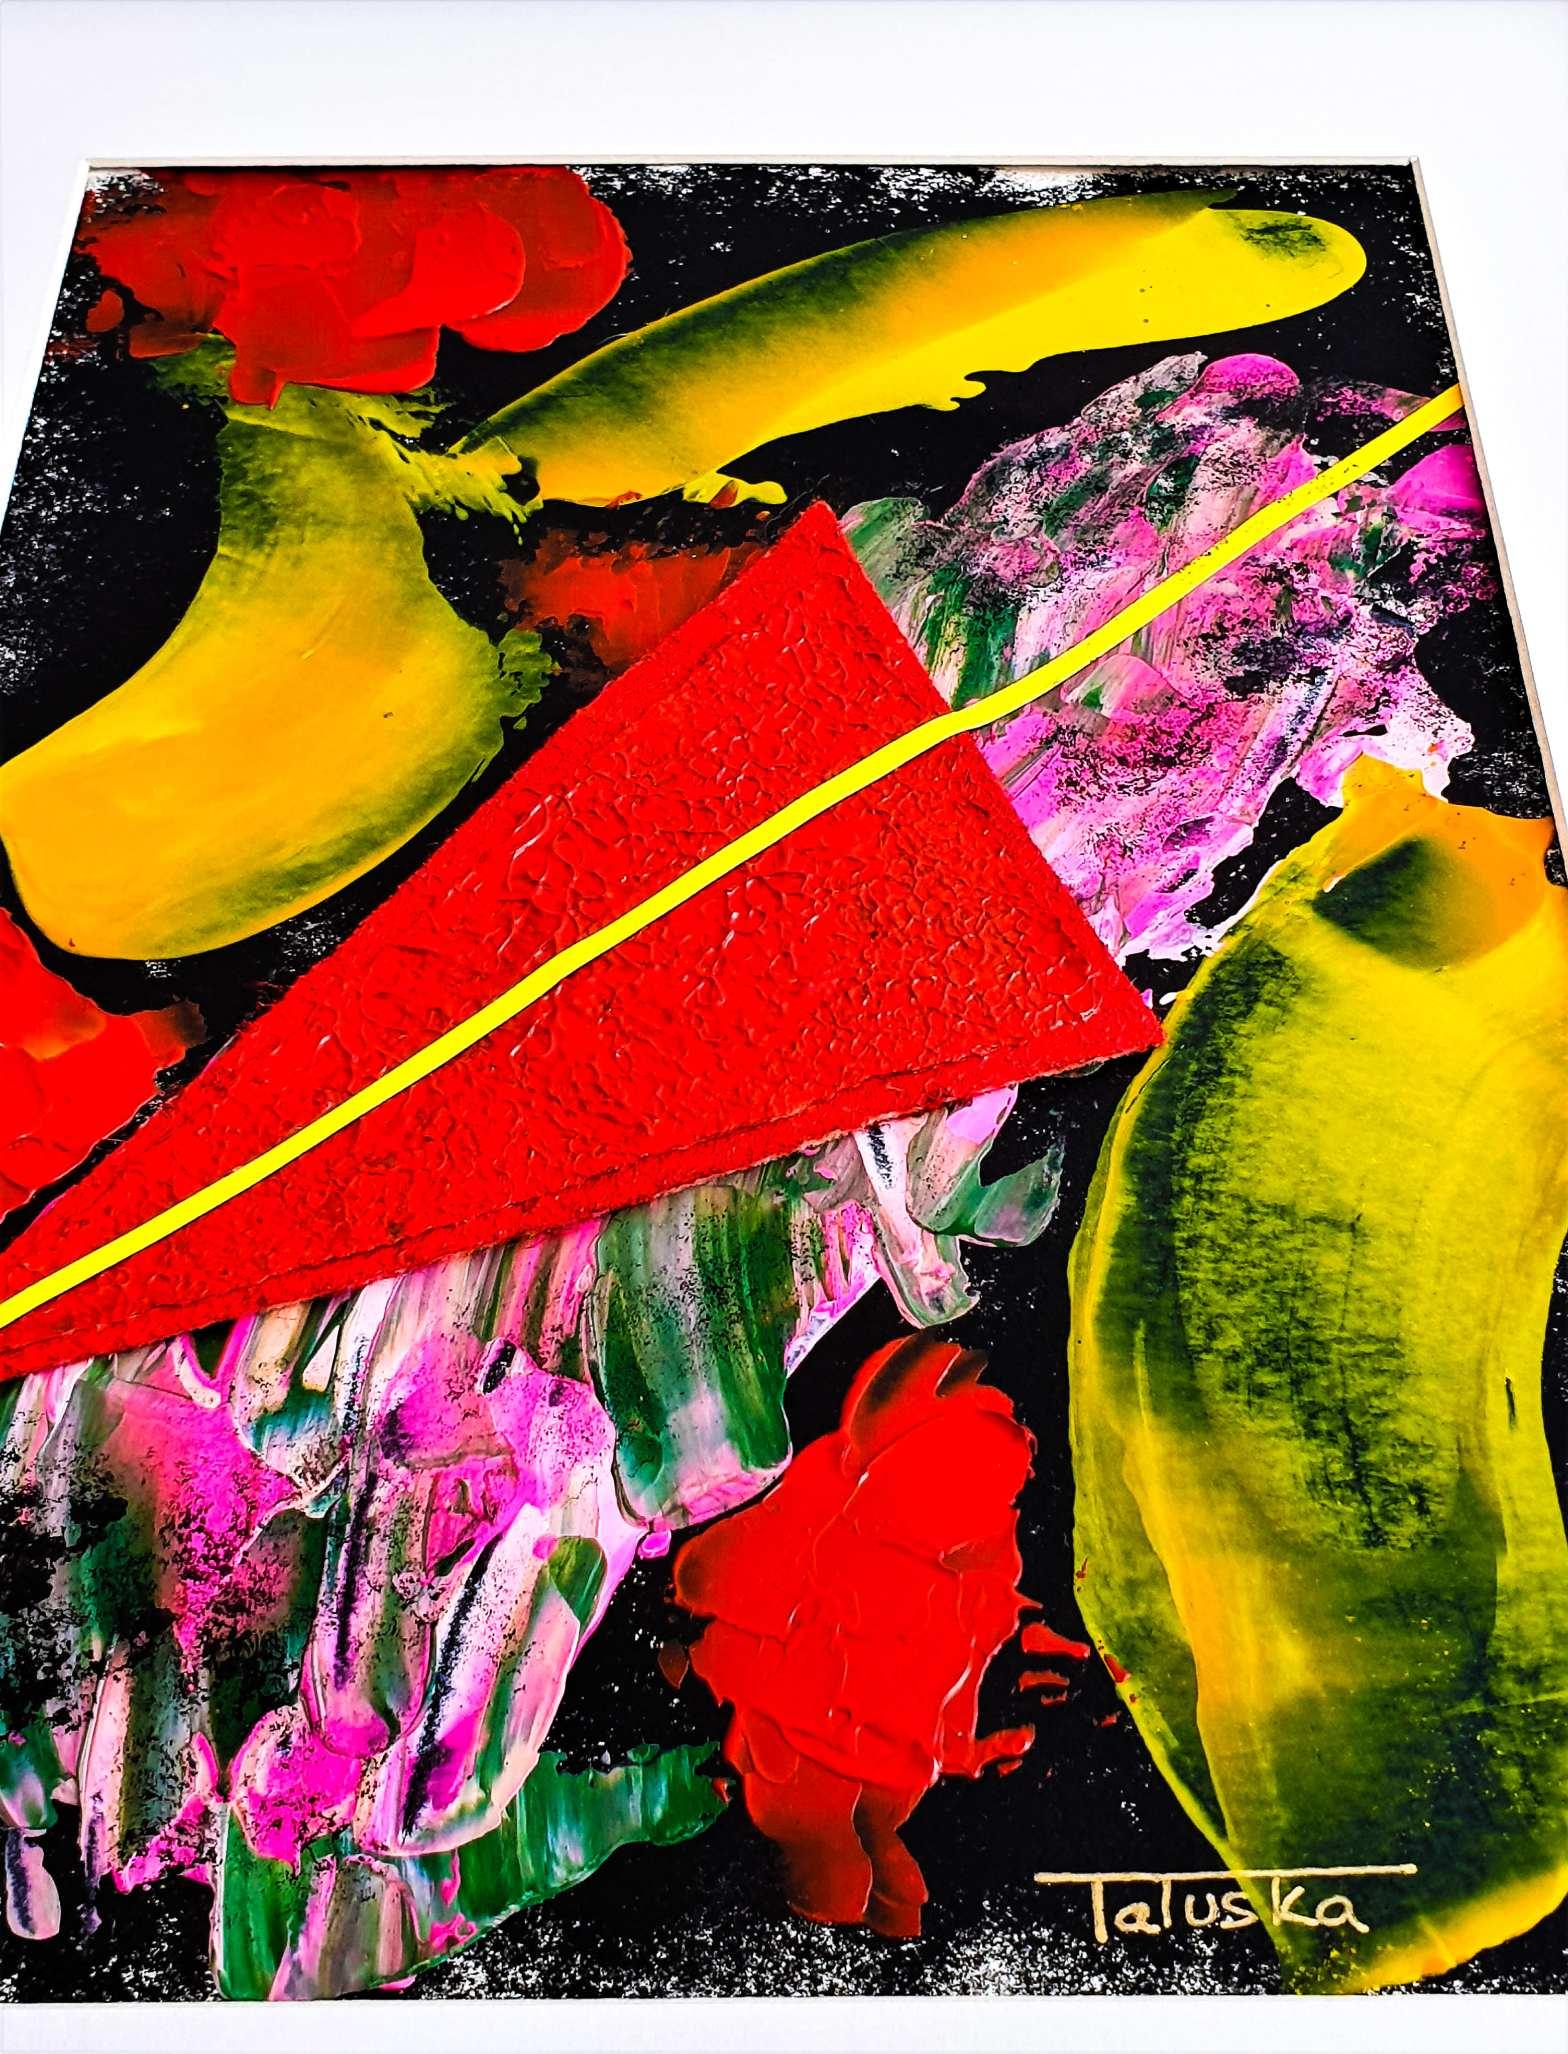 Fireworks. Tatuska 2021. Serie impresionismo abstracto